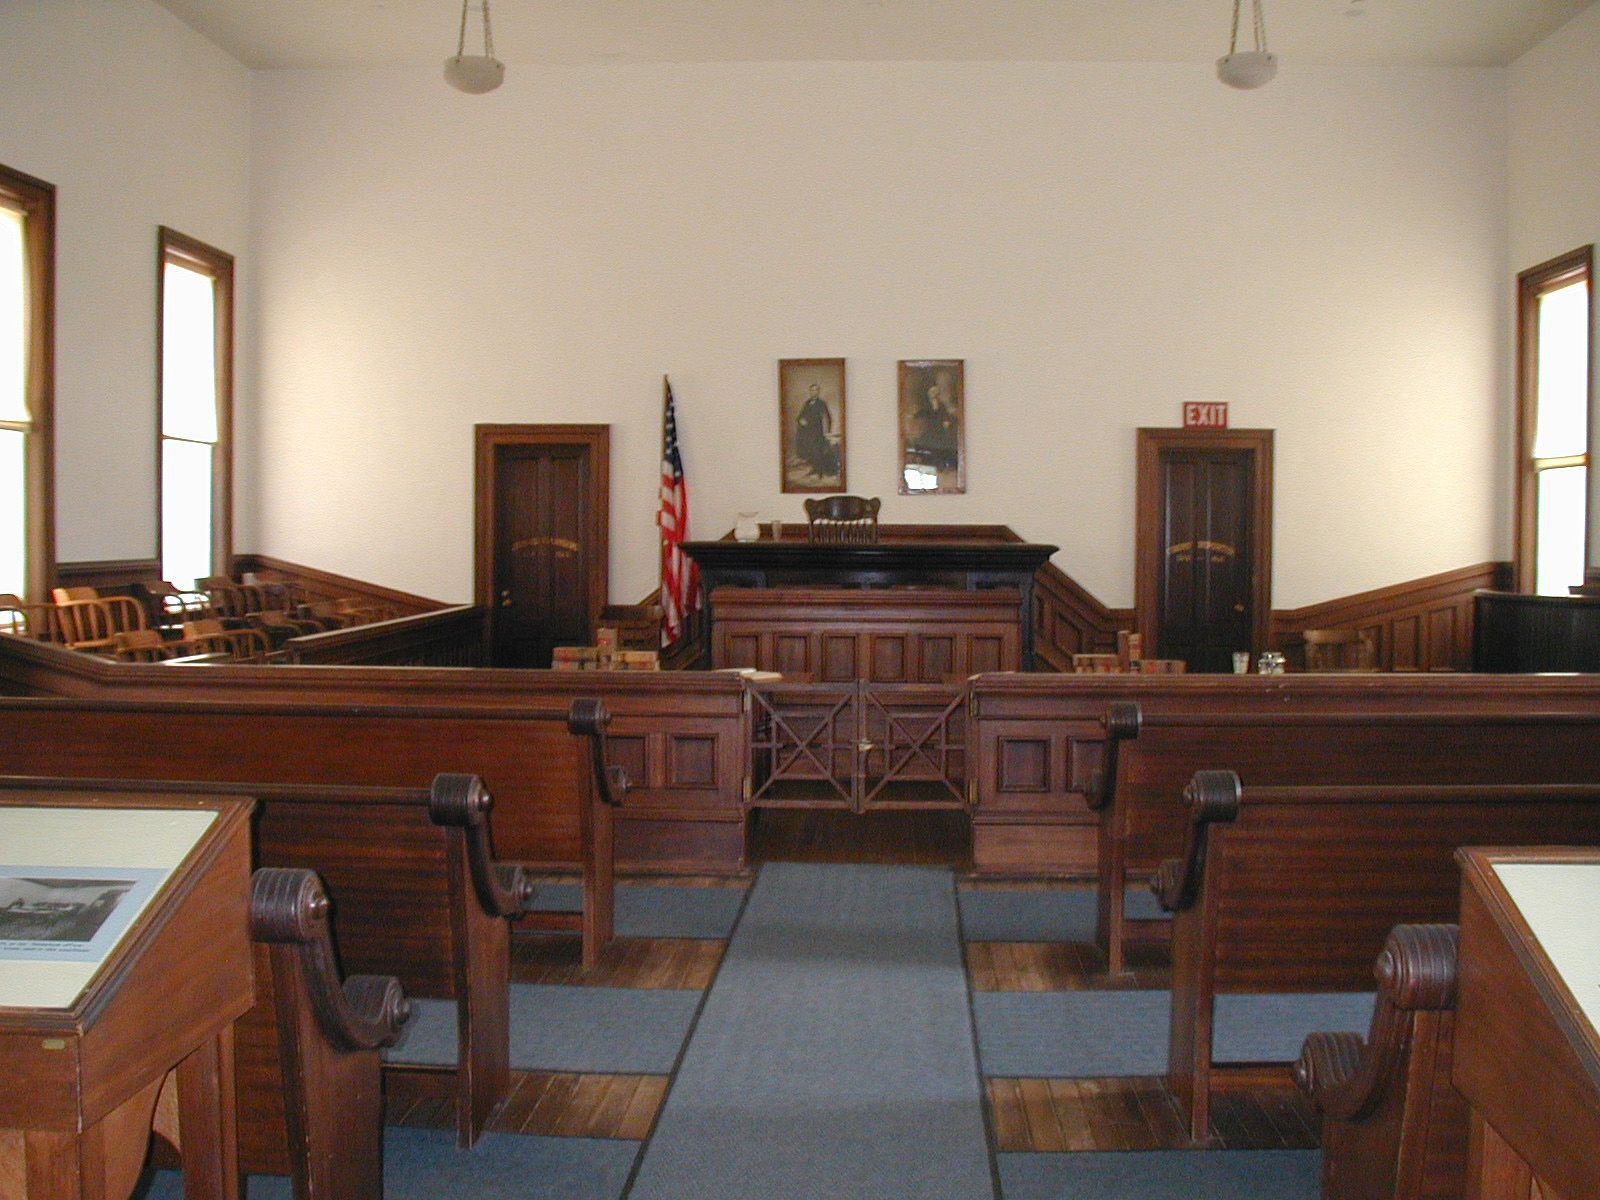 Arizona cochise county cochise - Inside Cochise County Courthouse In Tombstone Arizona